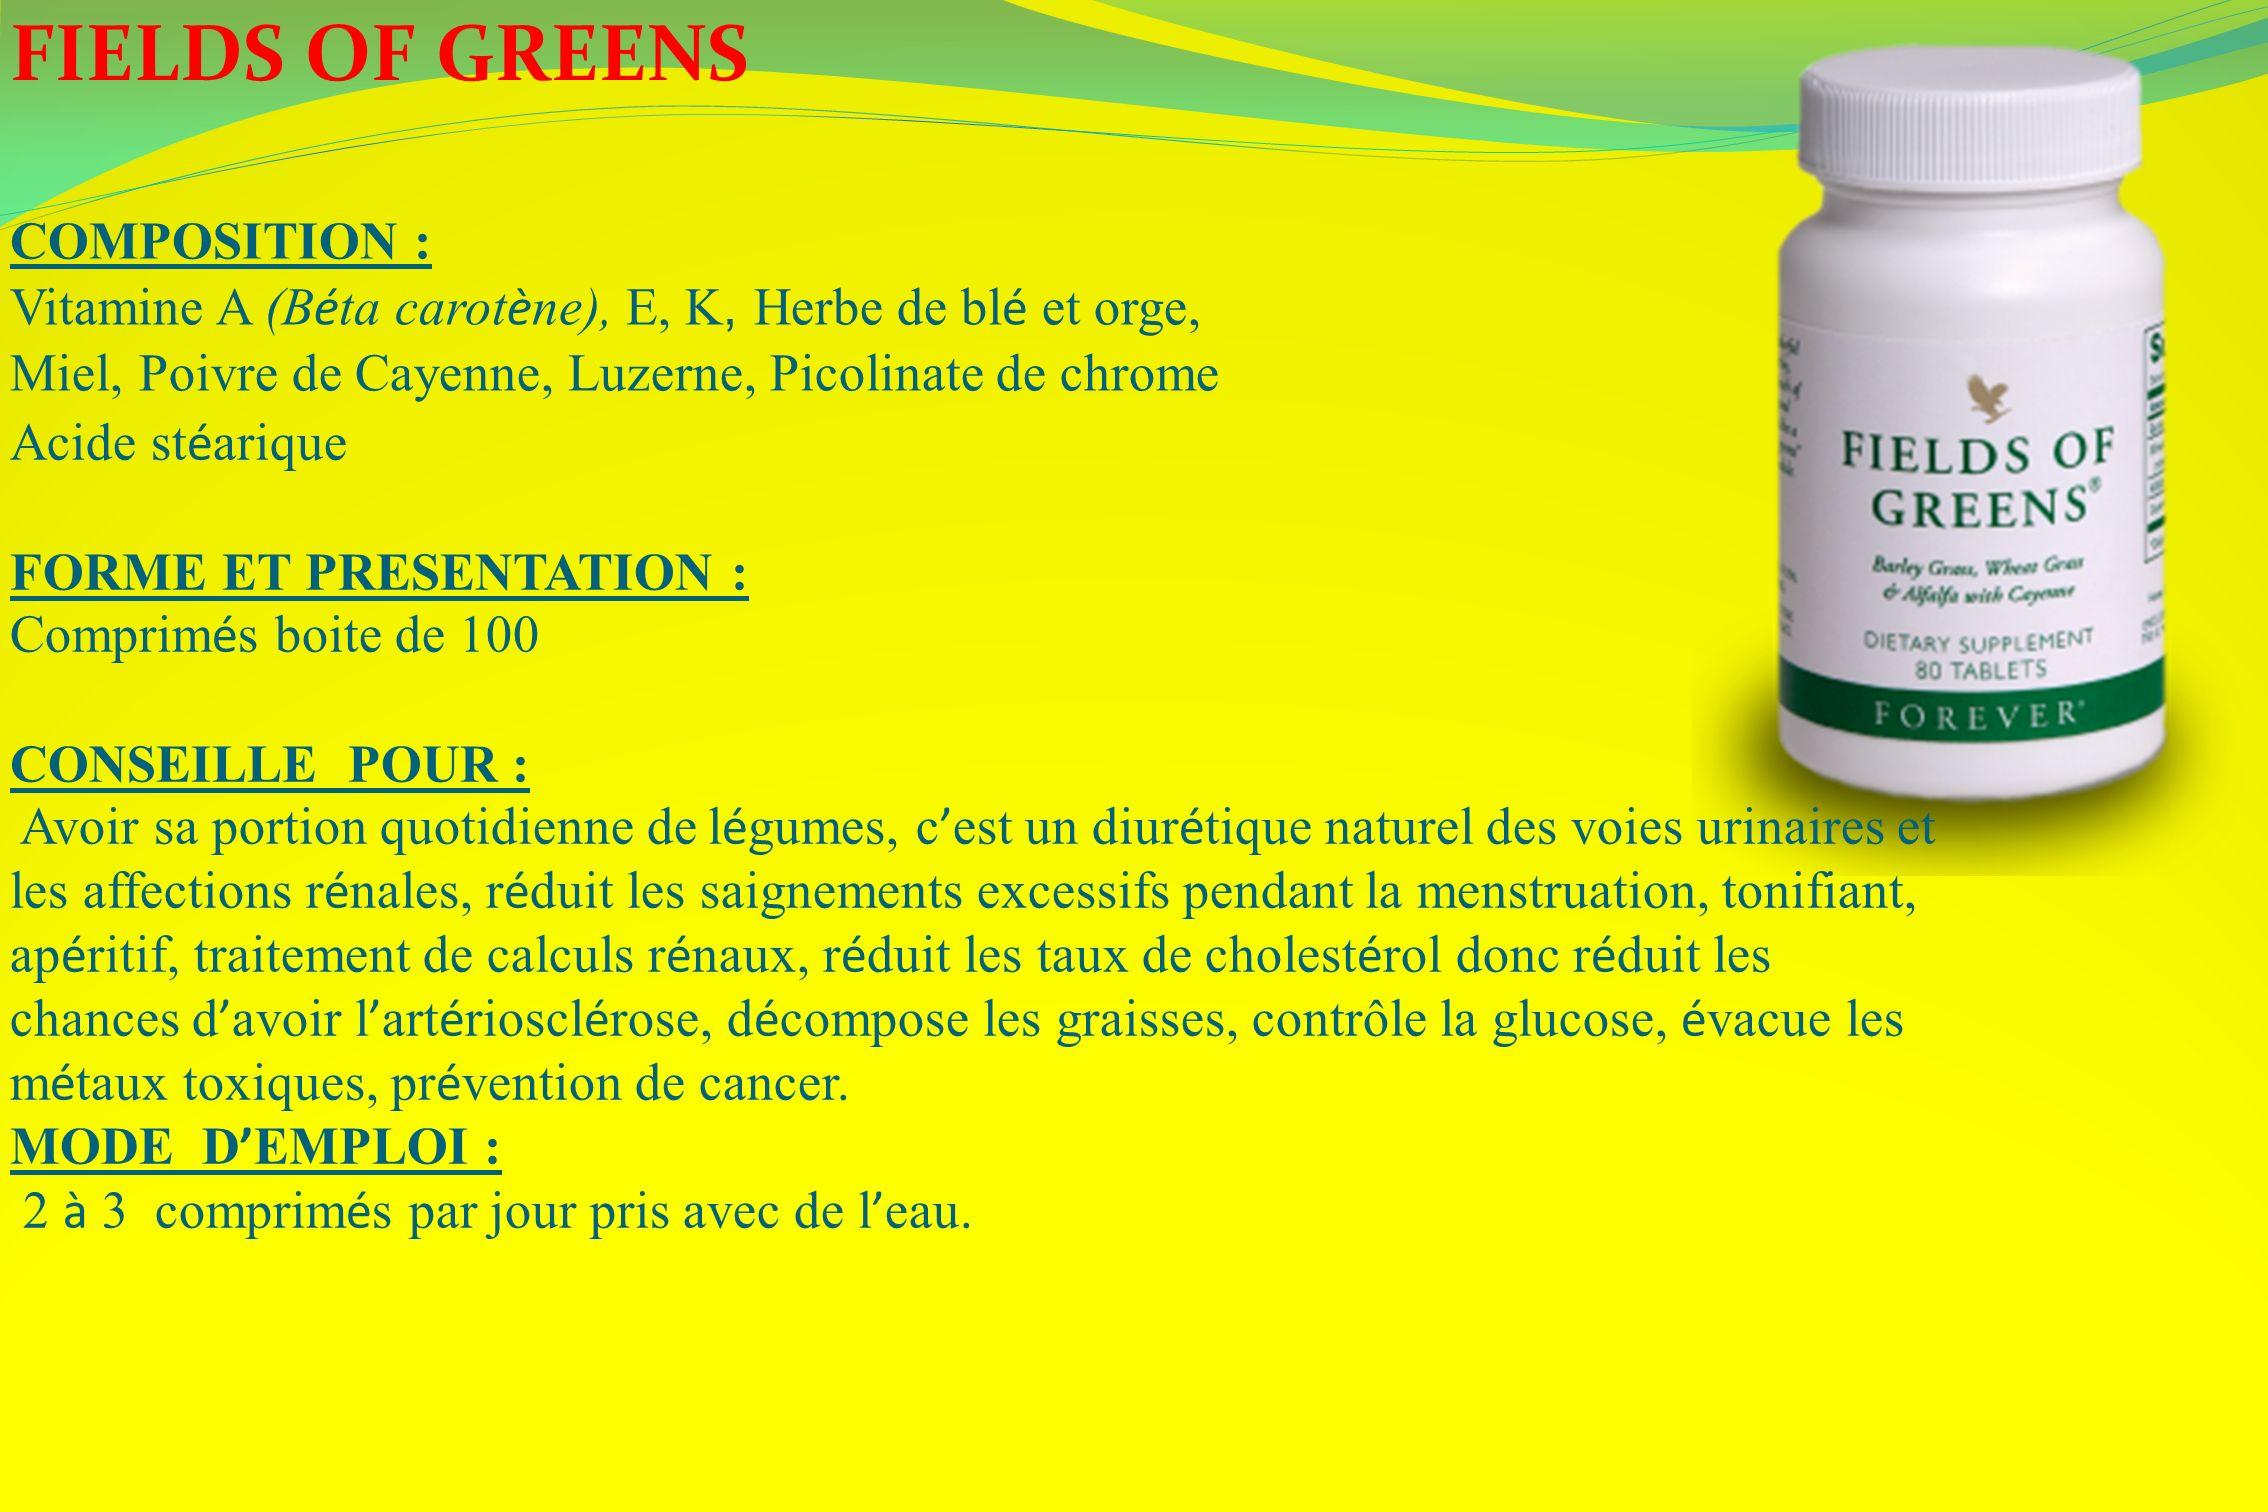 FIELDS OF GREENS COMPOSITION : Vitamine A (B é ta carot è ne), E, K, Herbe de bl é et orge, Miel, Poivre de Cayenne, Luzerne, Picolinate de chrome Aci